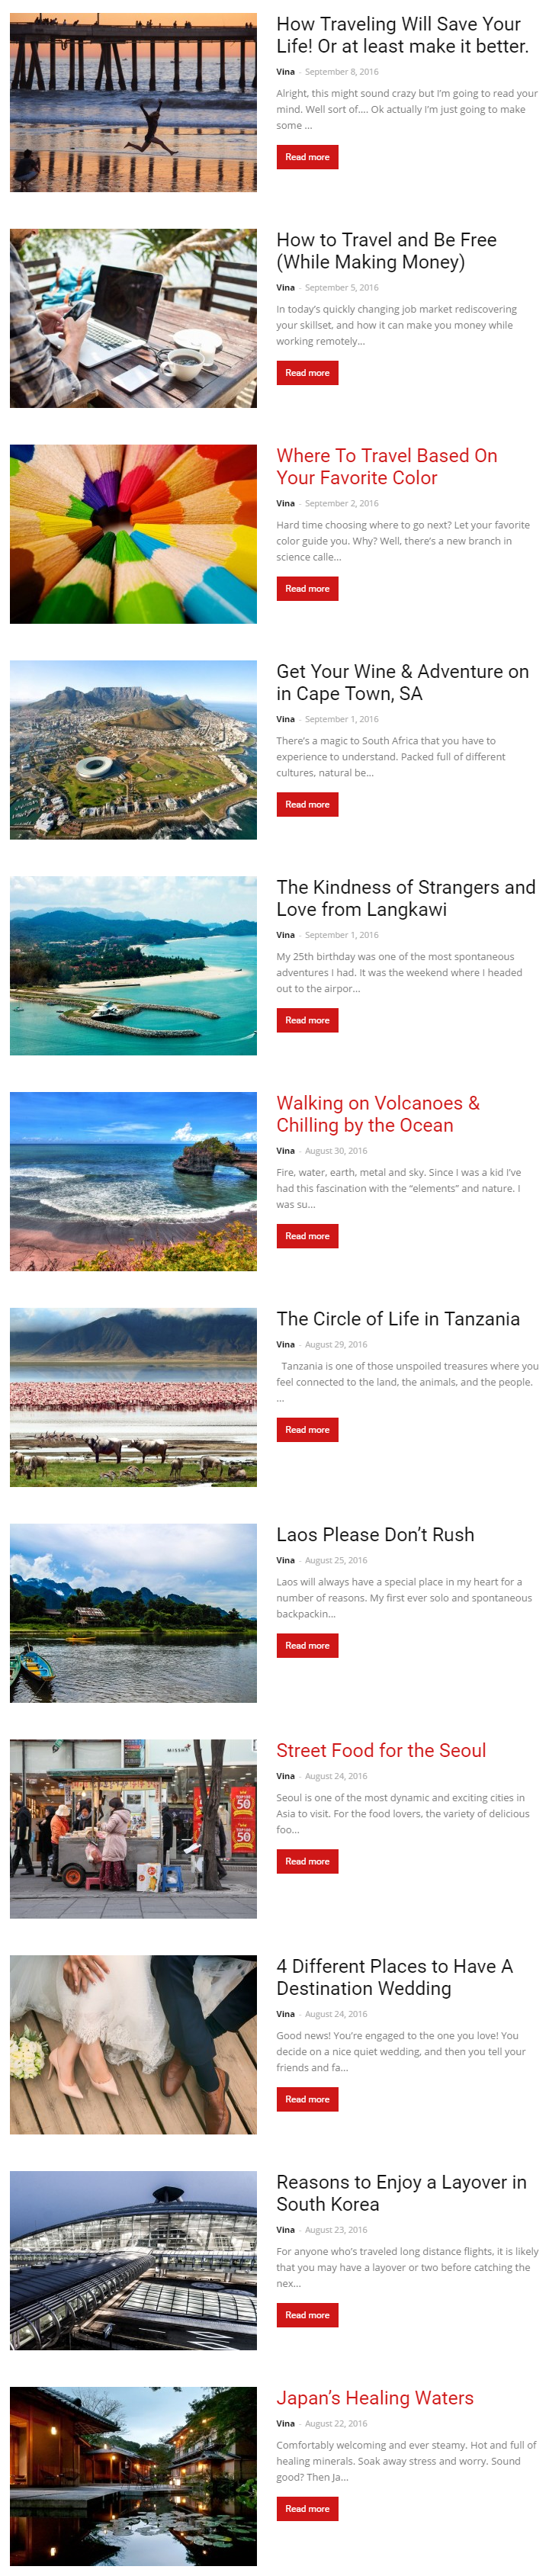 tourders blog